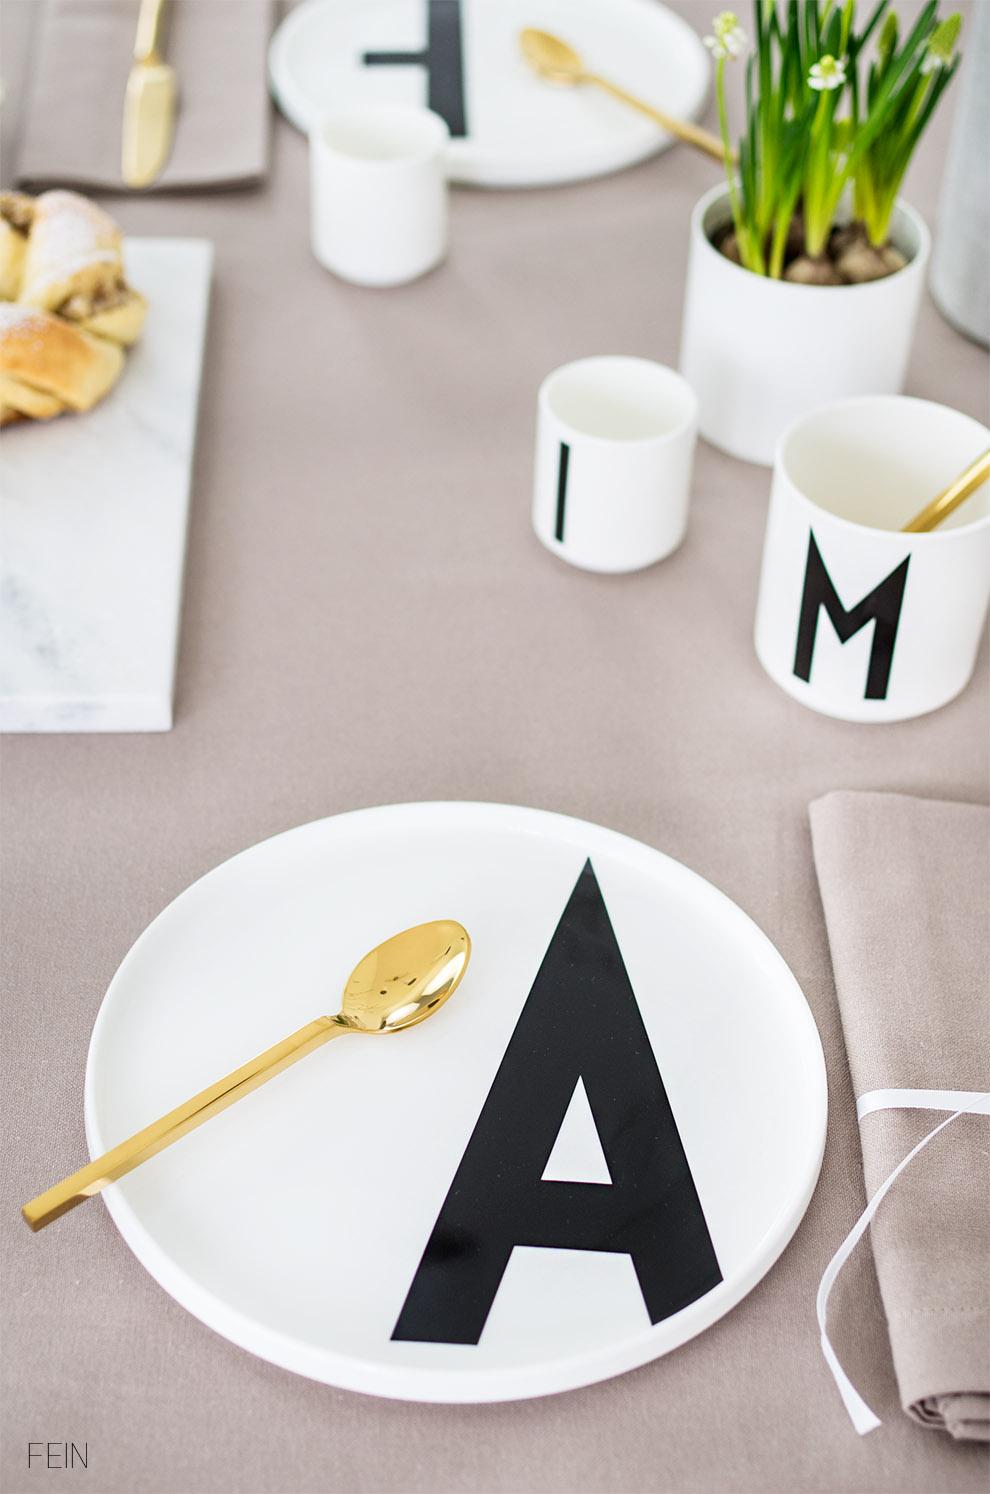 Design Letters Geschirr